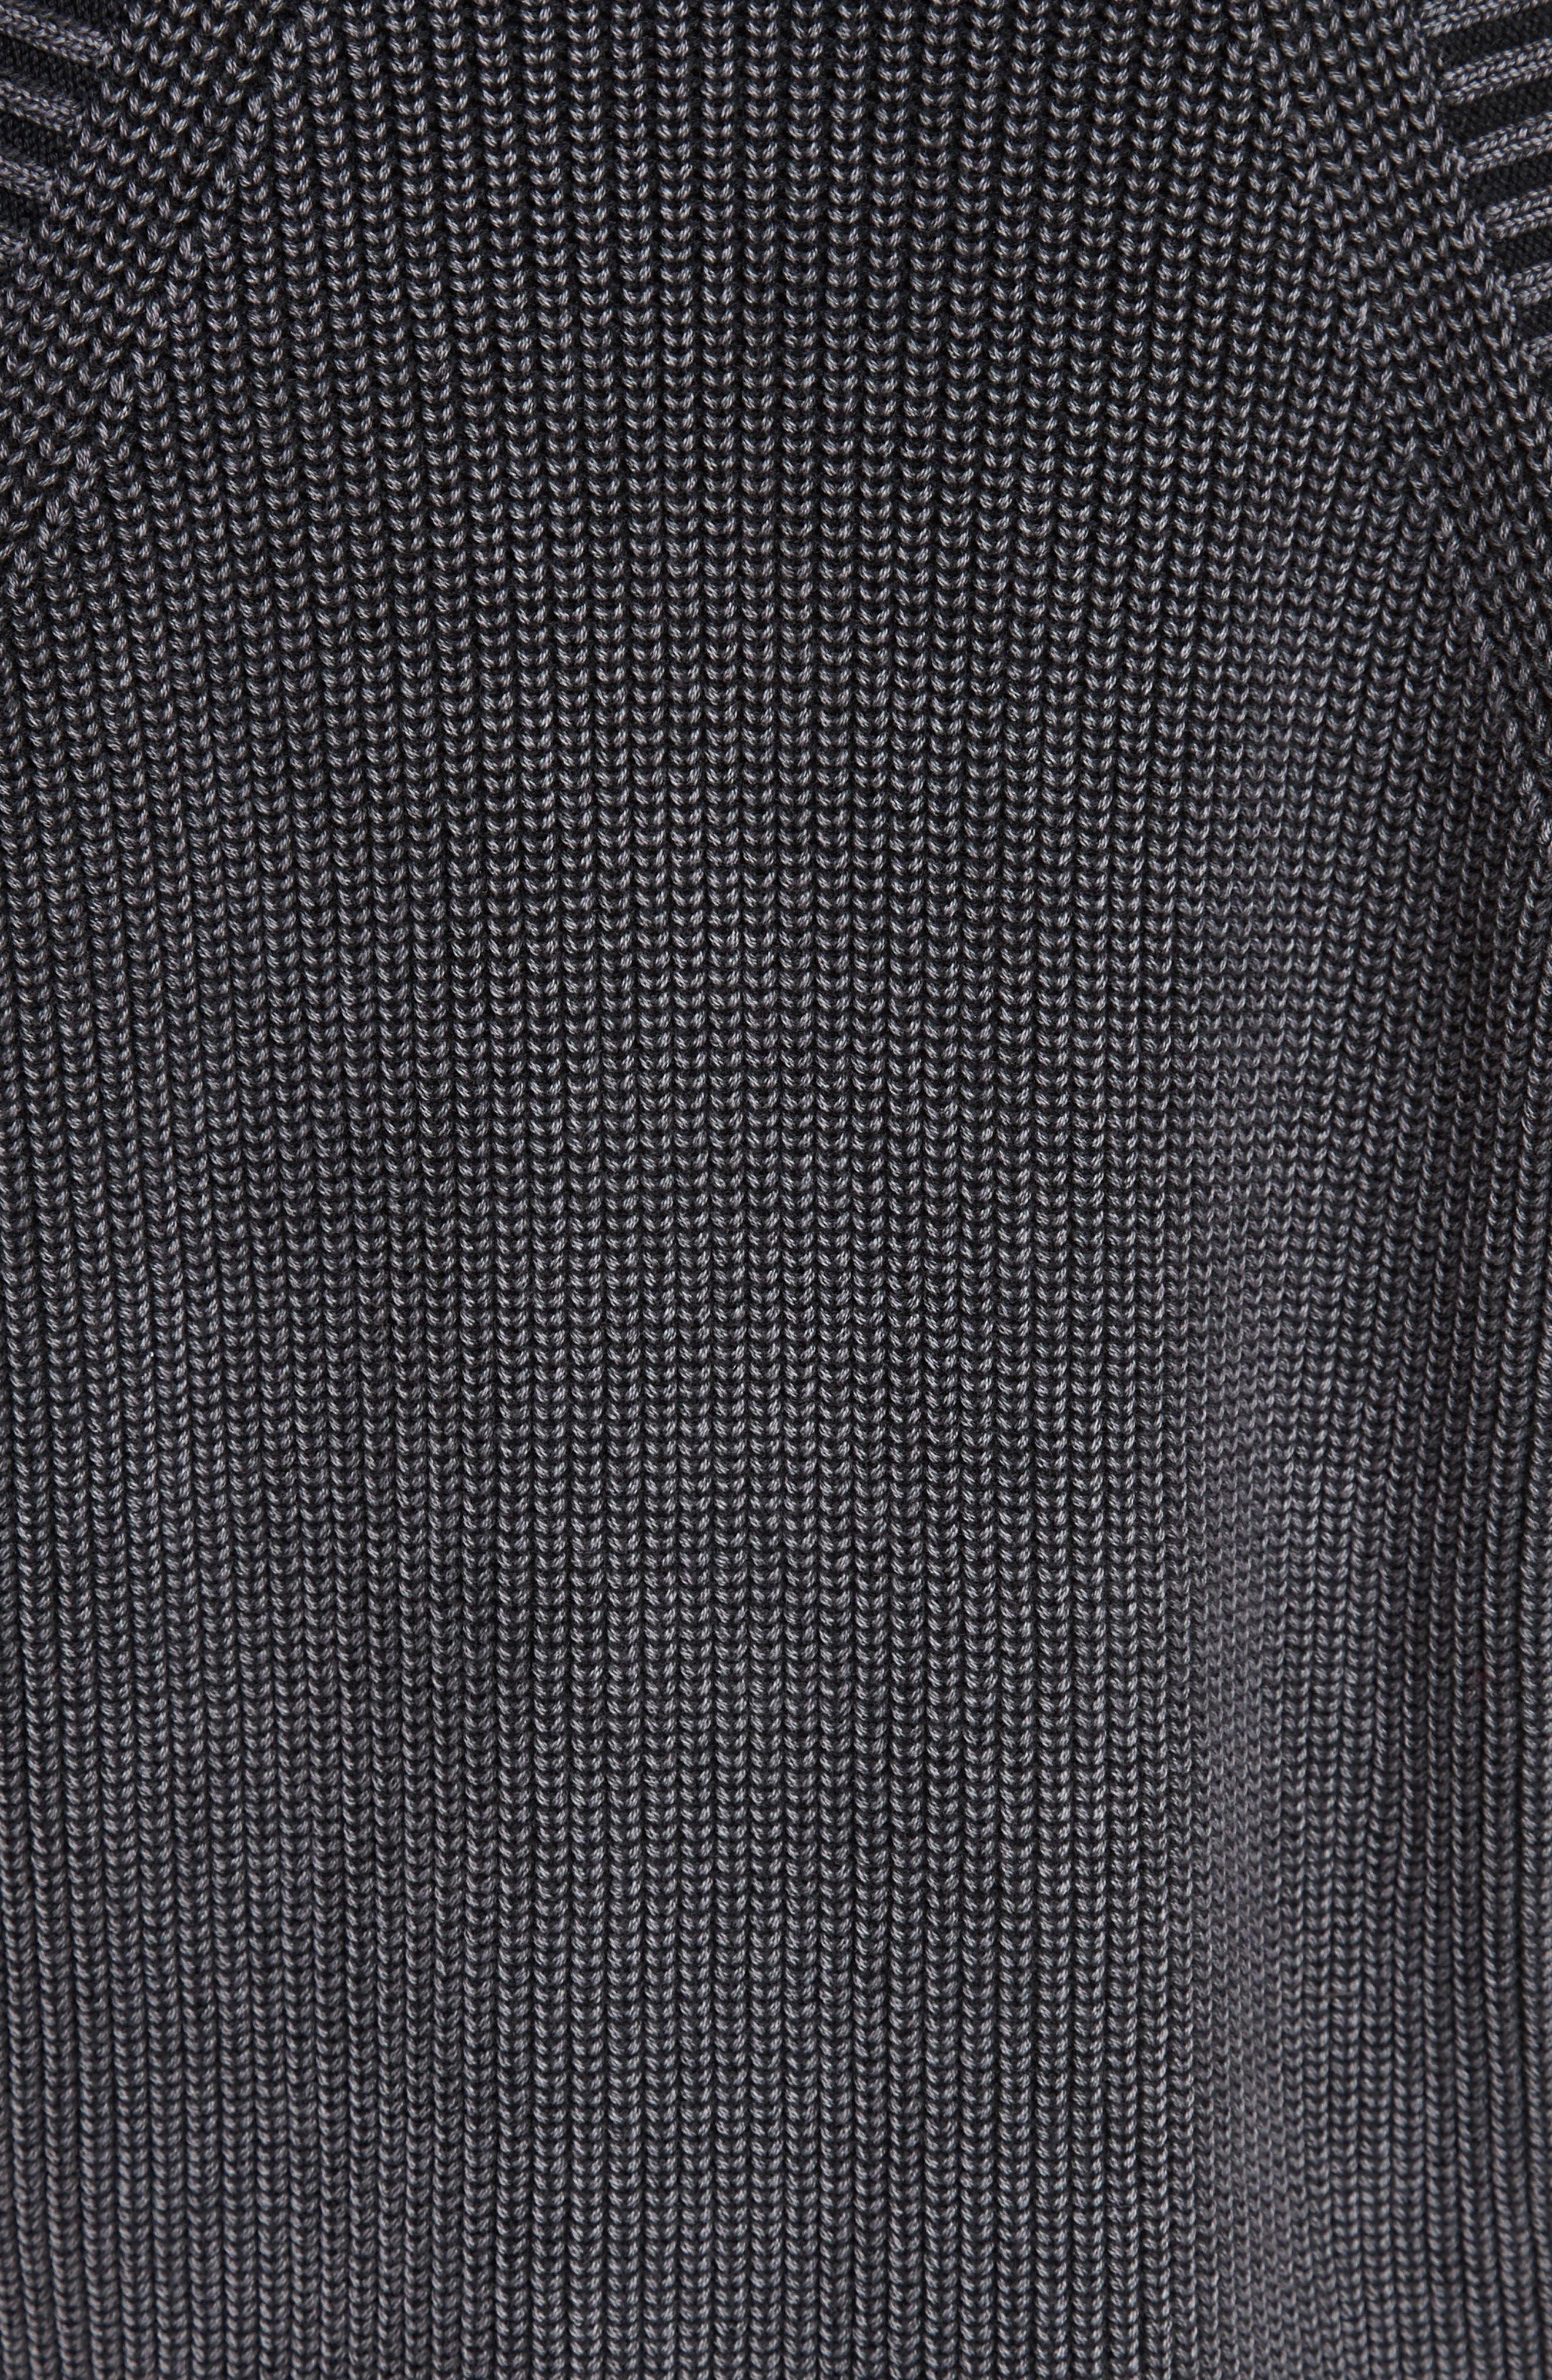 RAG & BONE,                             JEAN Dana Cold Shoulder Sweater,                             Alternate thumbnail 5, color,                             001